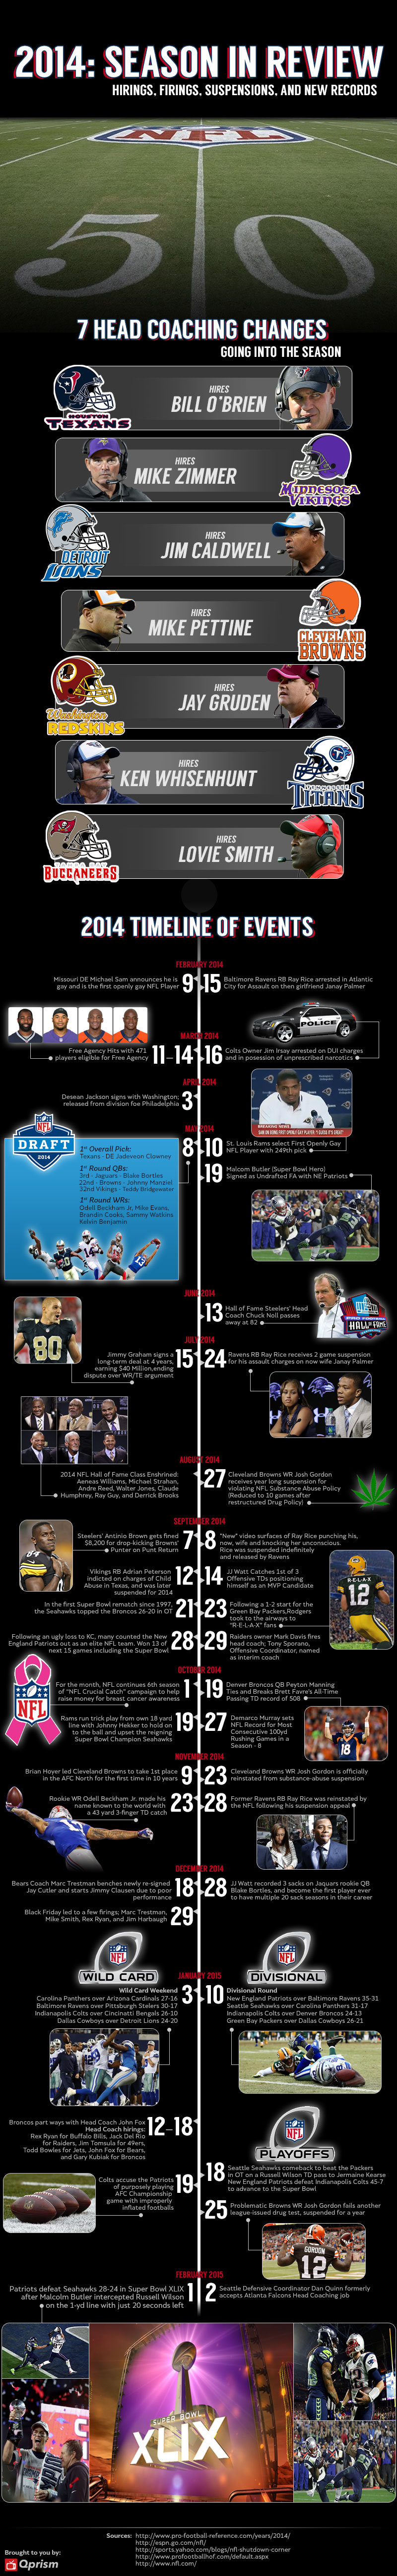 NFL-2014-season-in-review